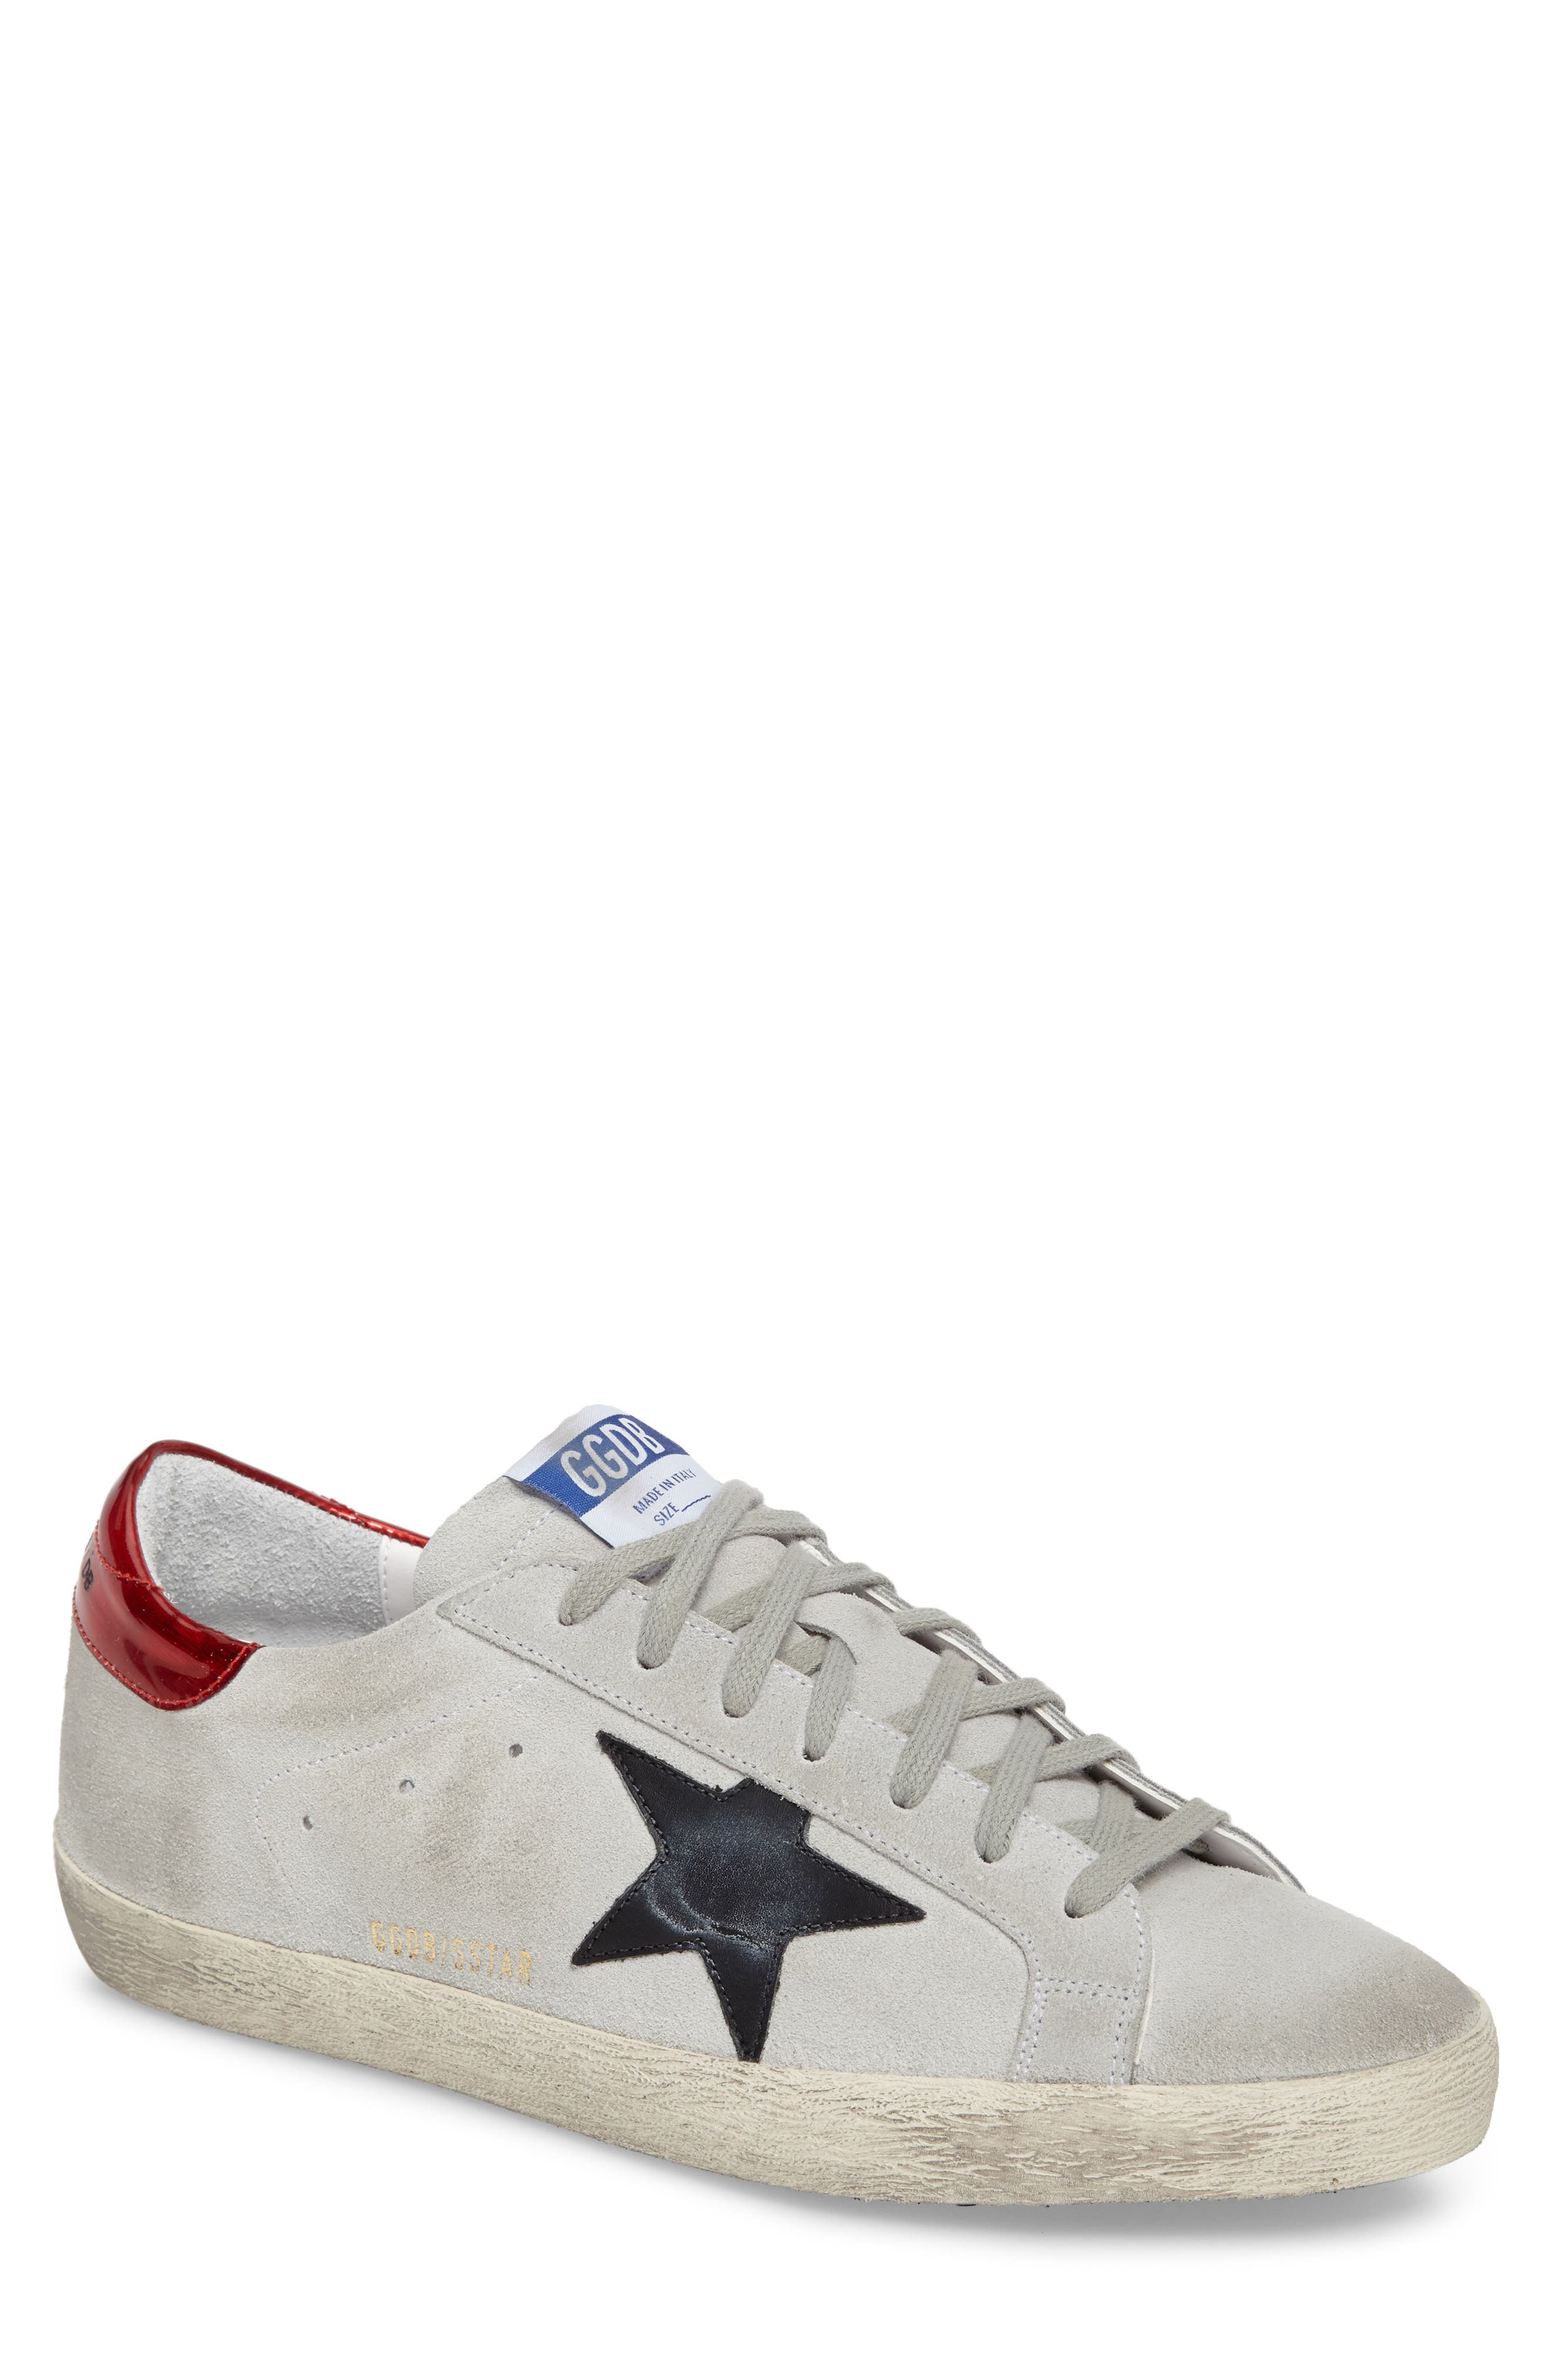 Main Image - Golden Goose 'Superstar' Sneaker (Men)